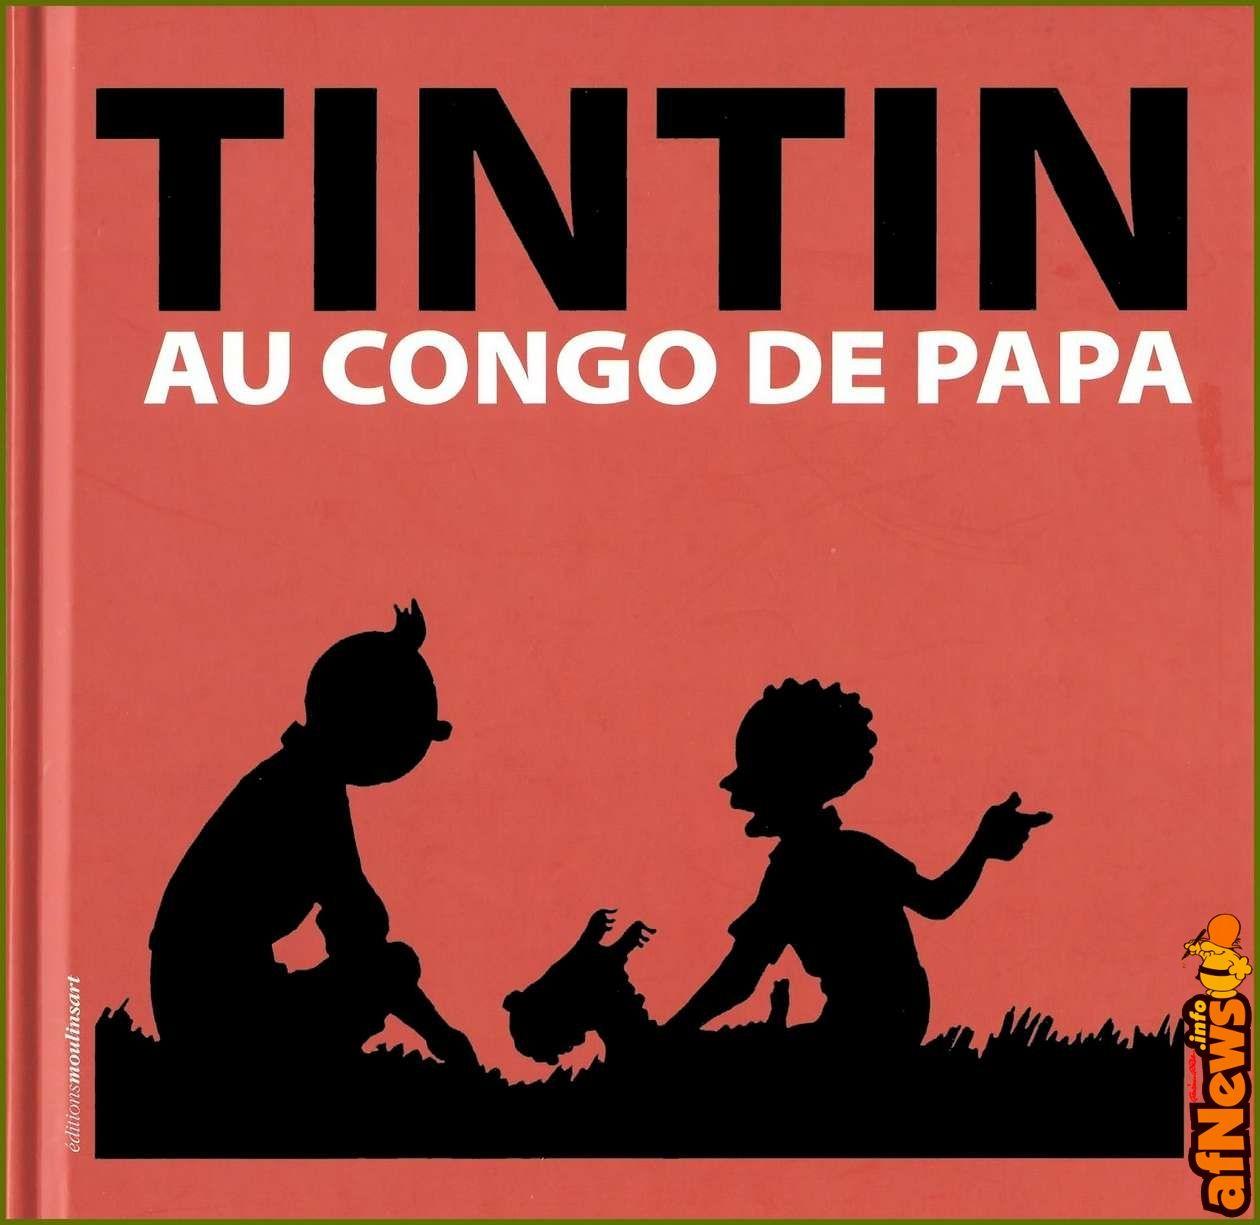 Zona BéDé: Tintin in Congo... - http://www.afnews.info/wordpress/2017/01/27/zona-bede-tintin-in-congo/